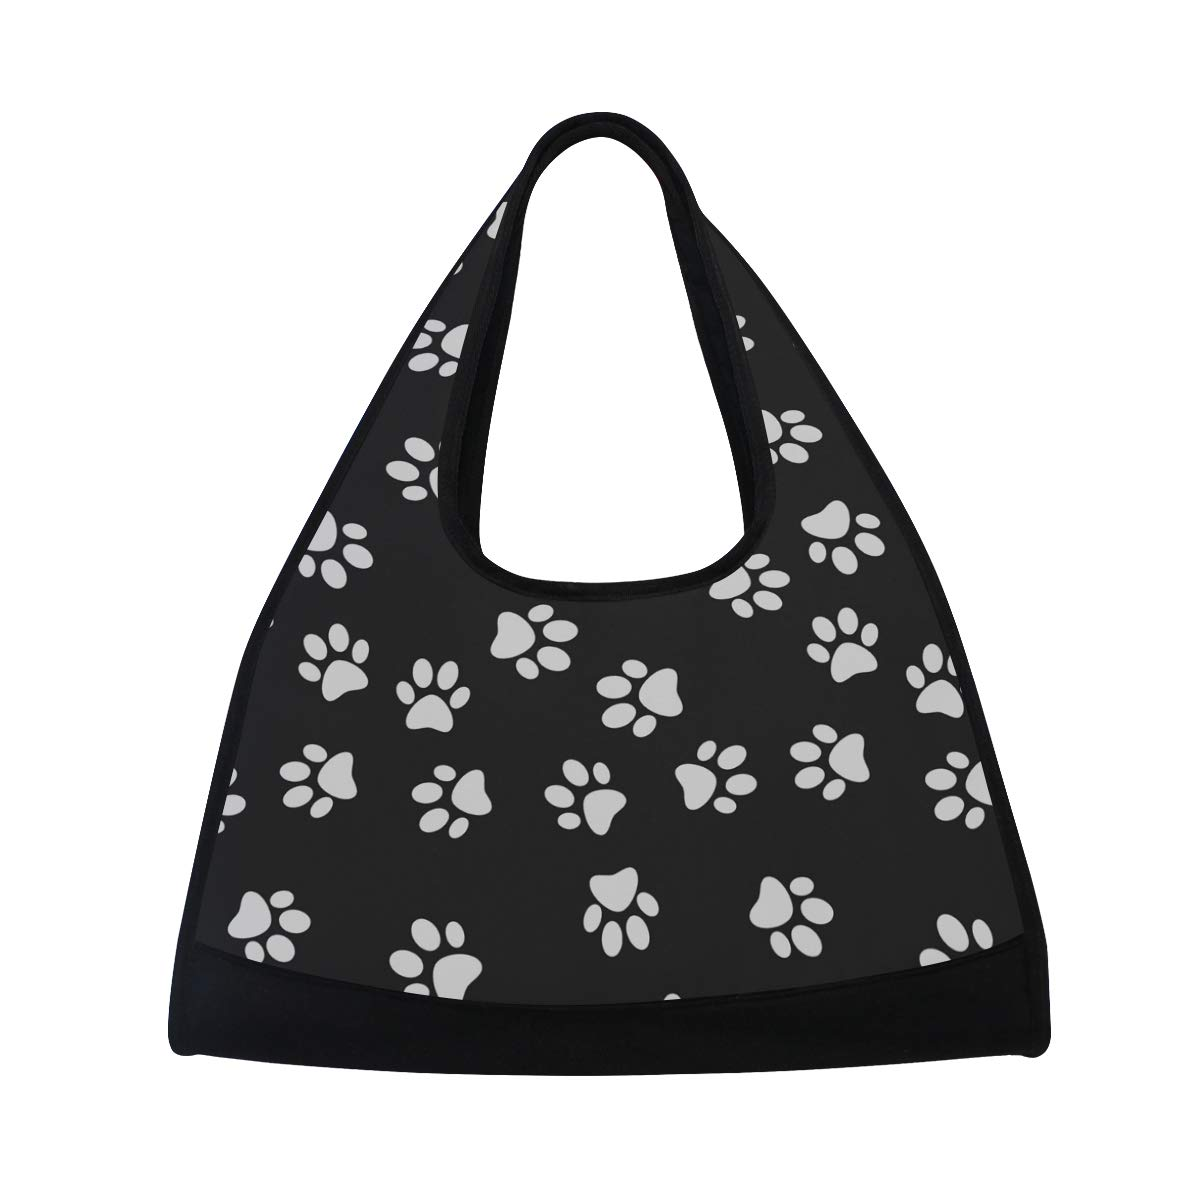 Dog Cat Paw Prints Women Sports Gym Totes Bag Multi-Function Nylon Travel Shoulder Bag